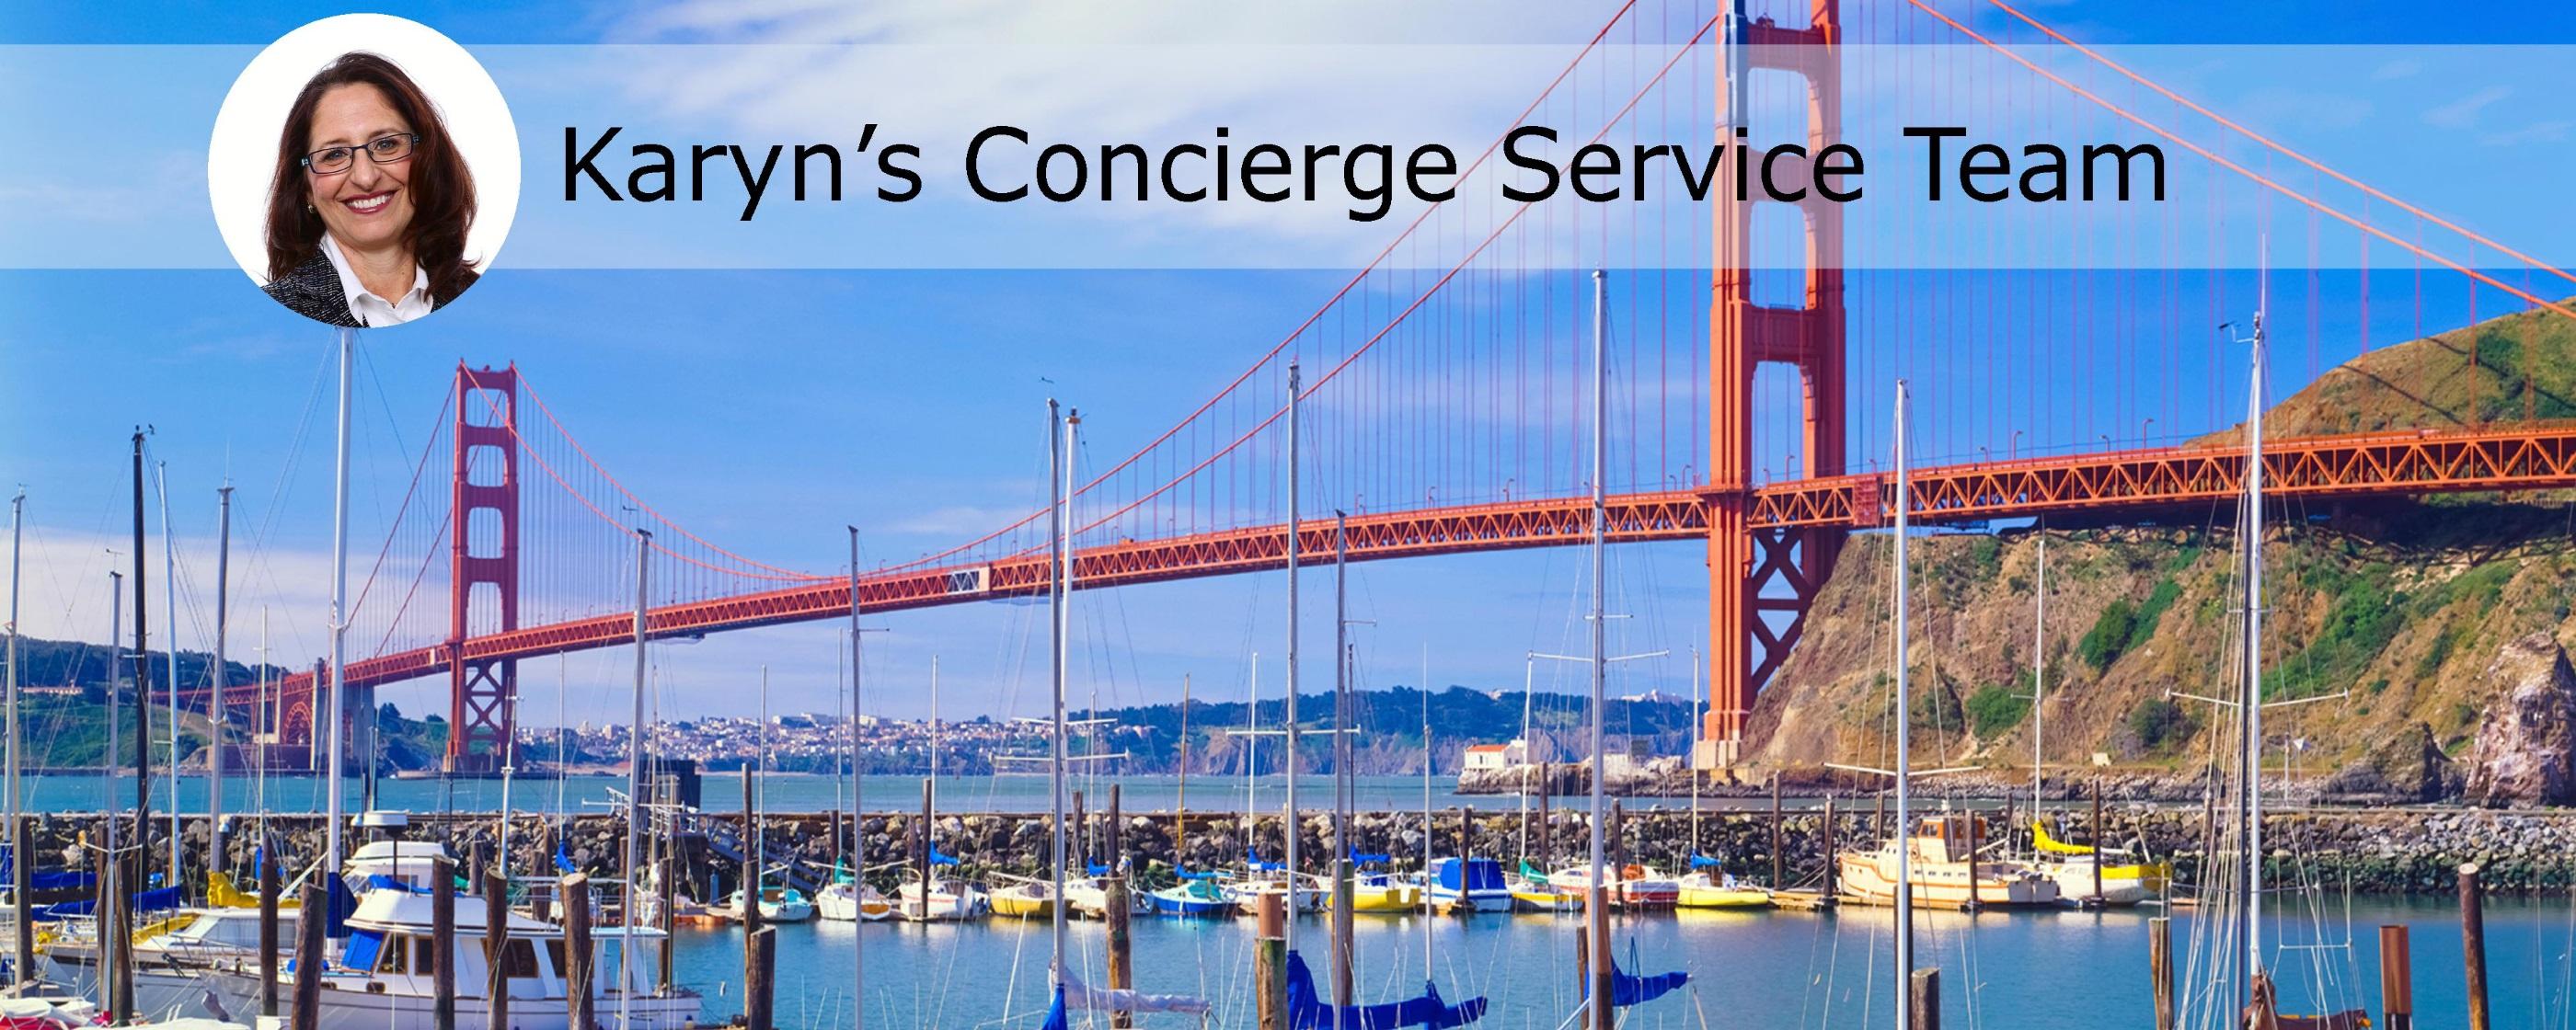 Karyn's Concierge Service Team